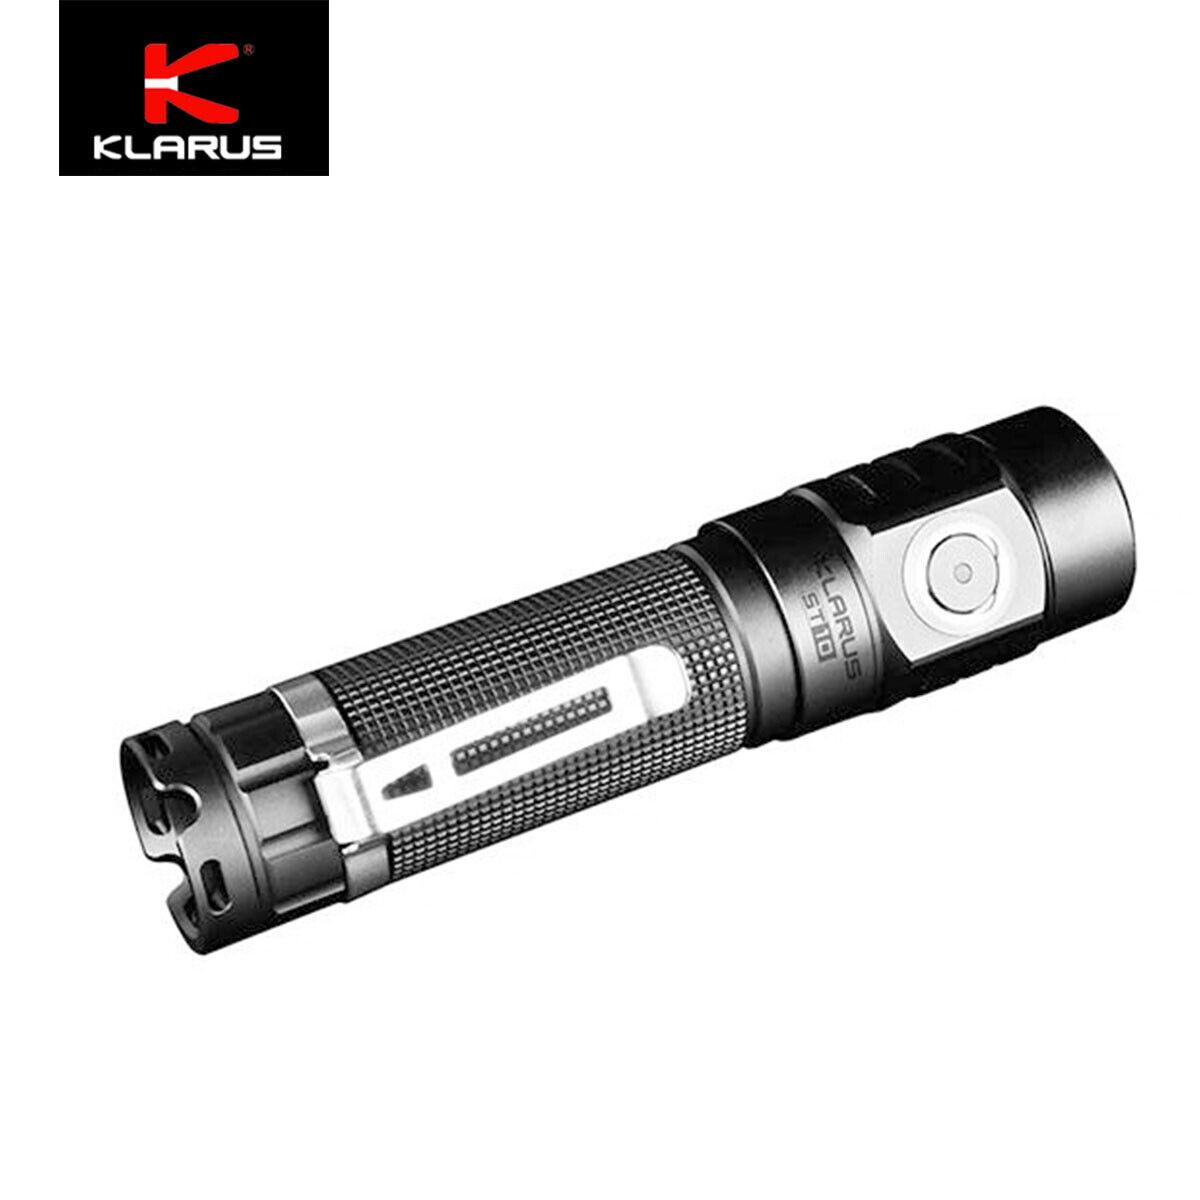 Klarus ST10 1100 Lumens Compact Lightweight Led Flashlight Micro-USB recharging